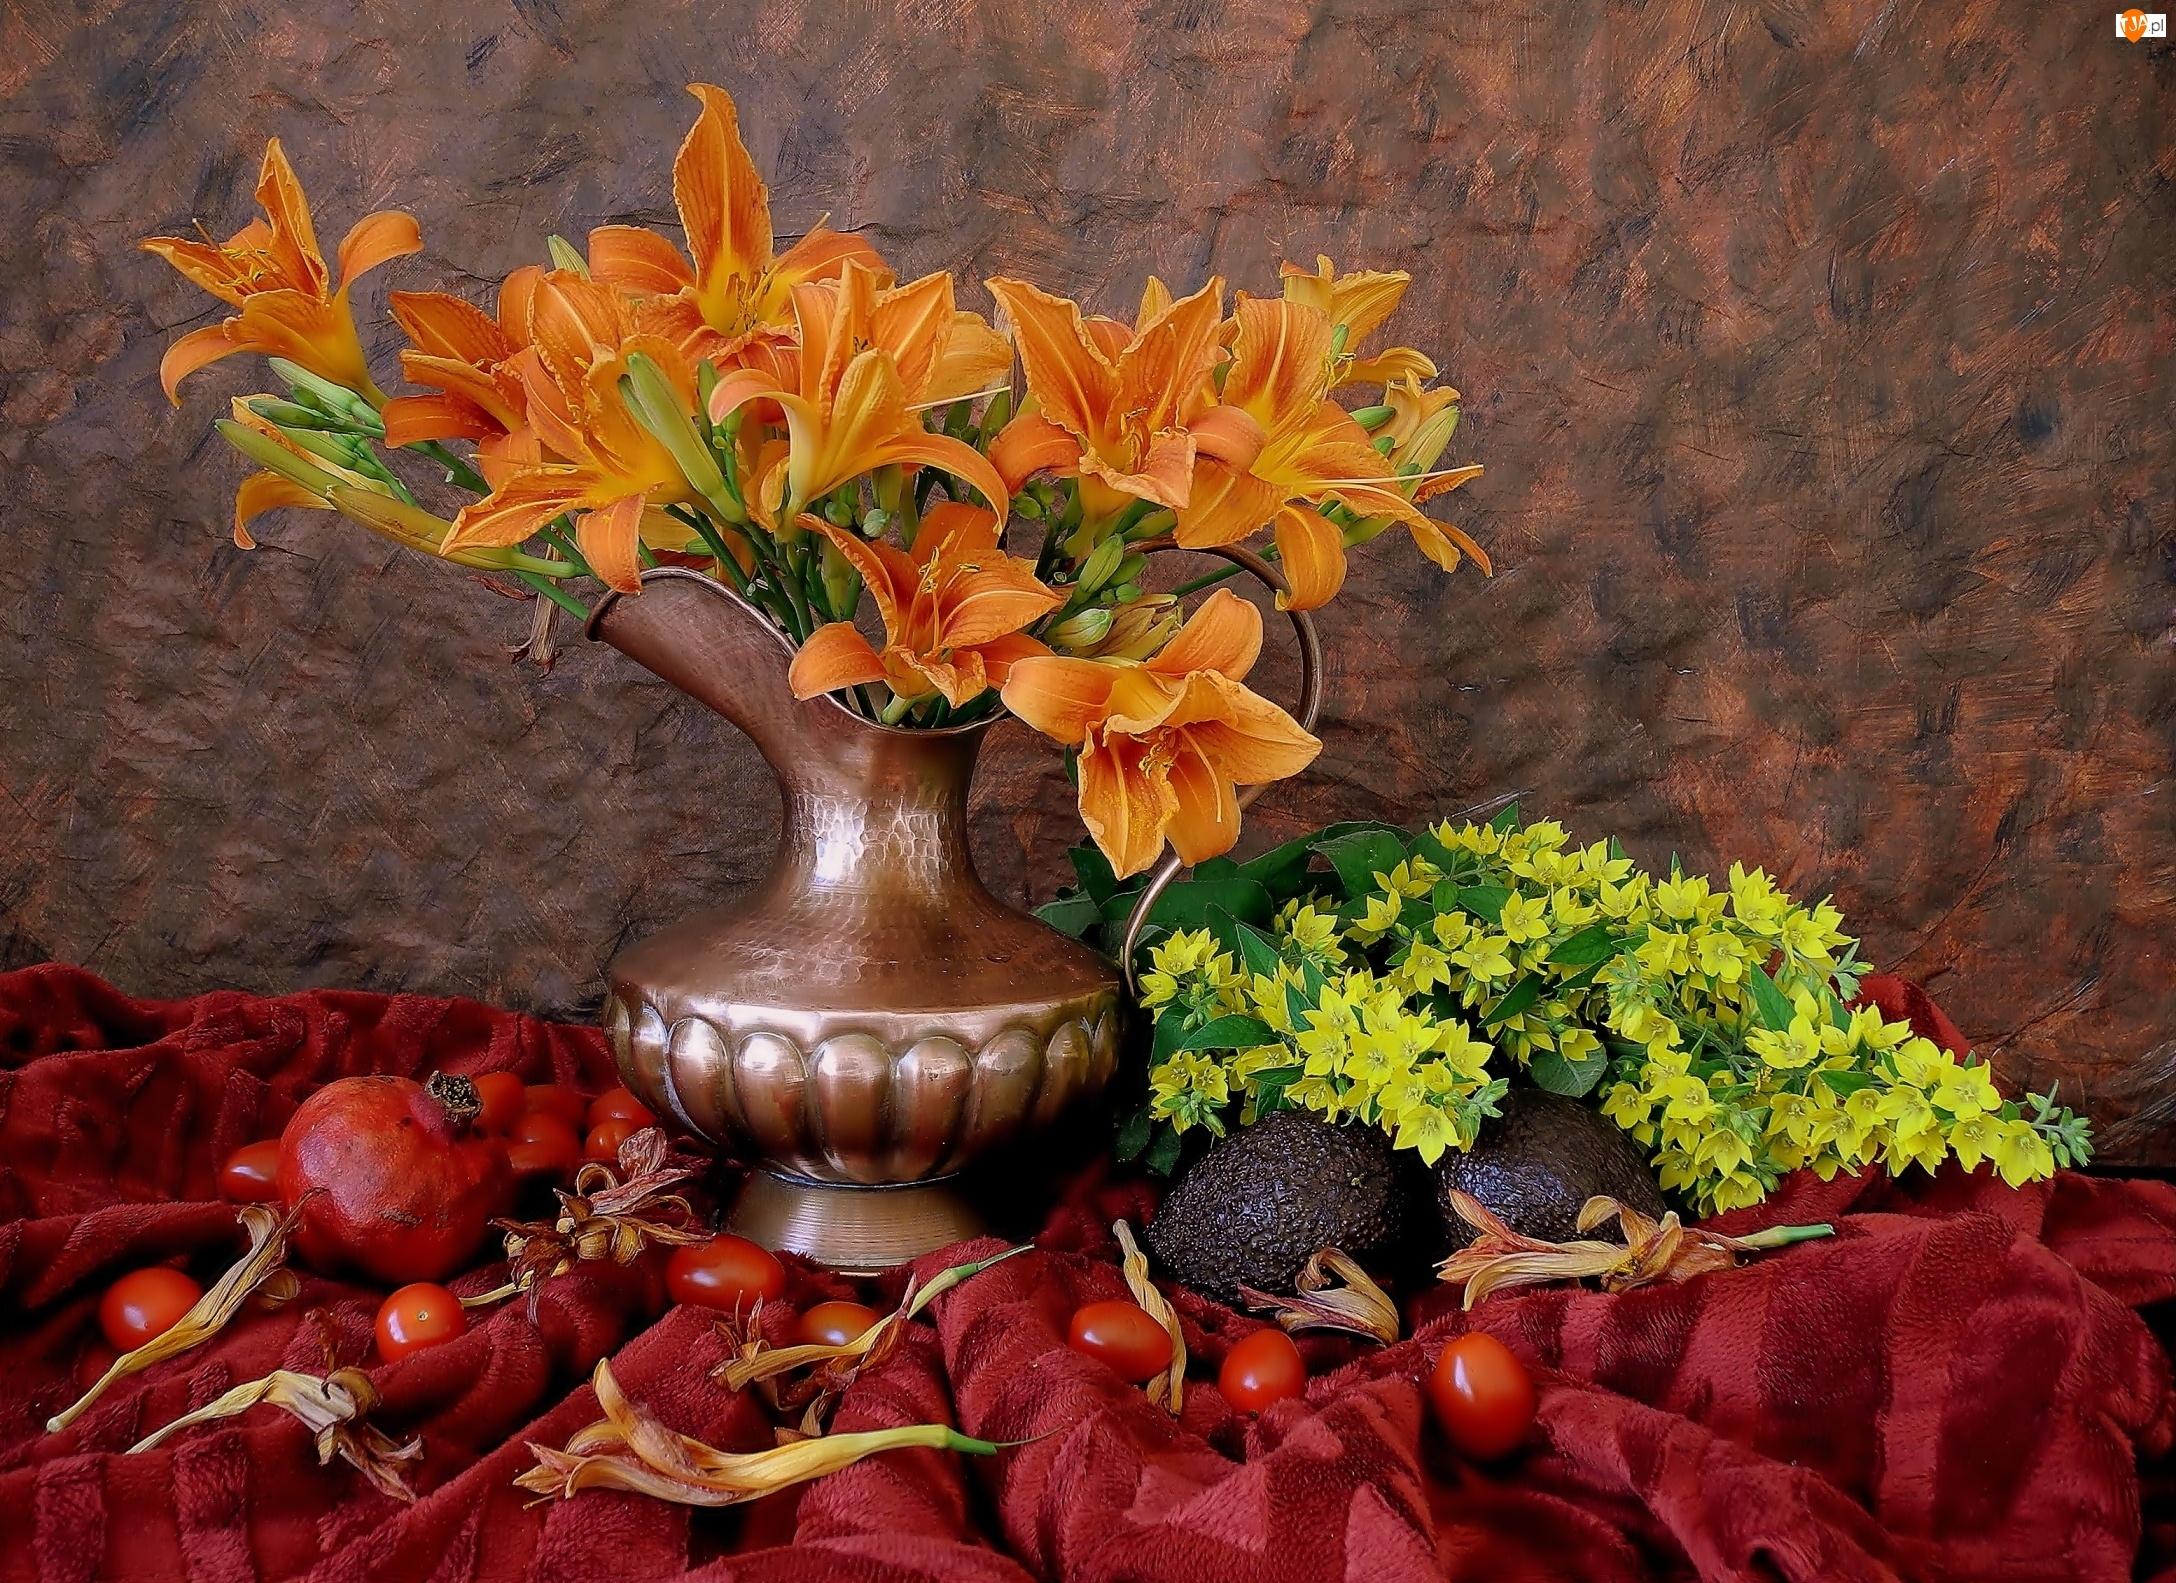 Bukiet, Kwiaty, Granat, Flakon, Pomidory